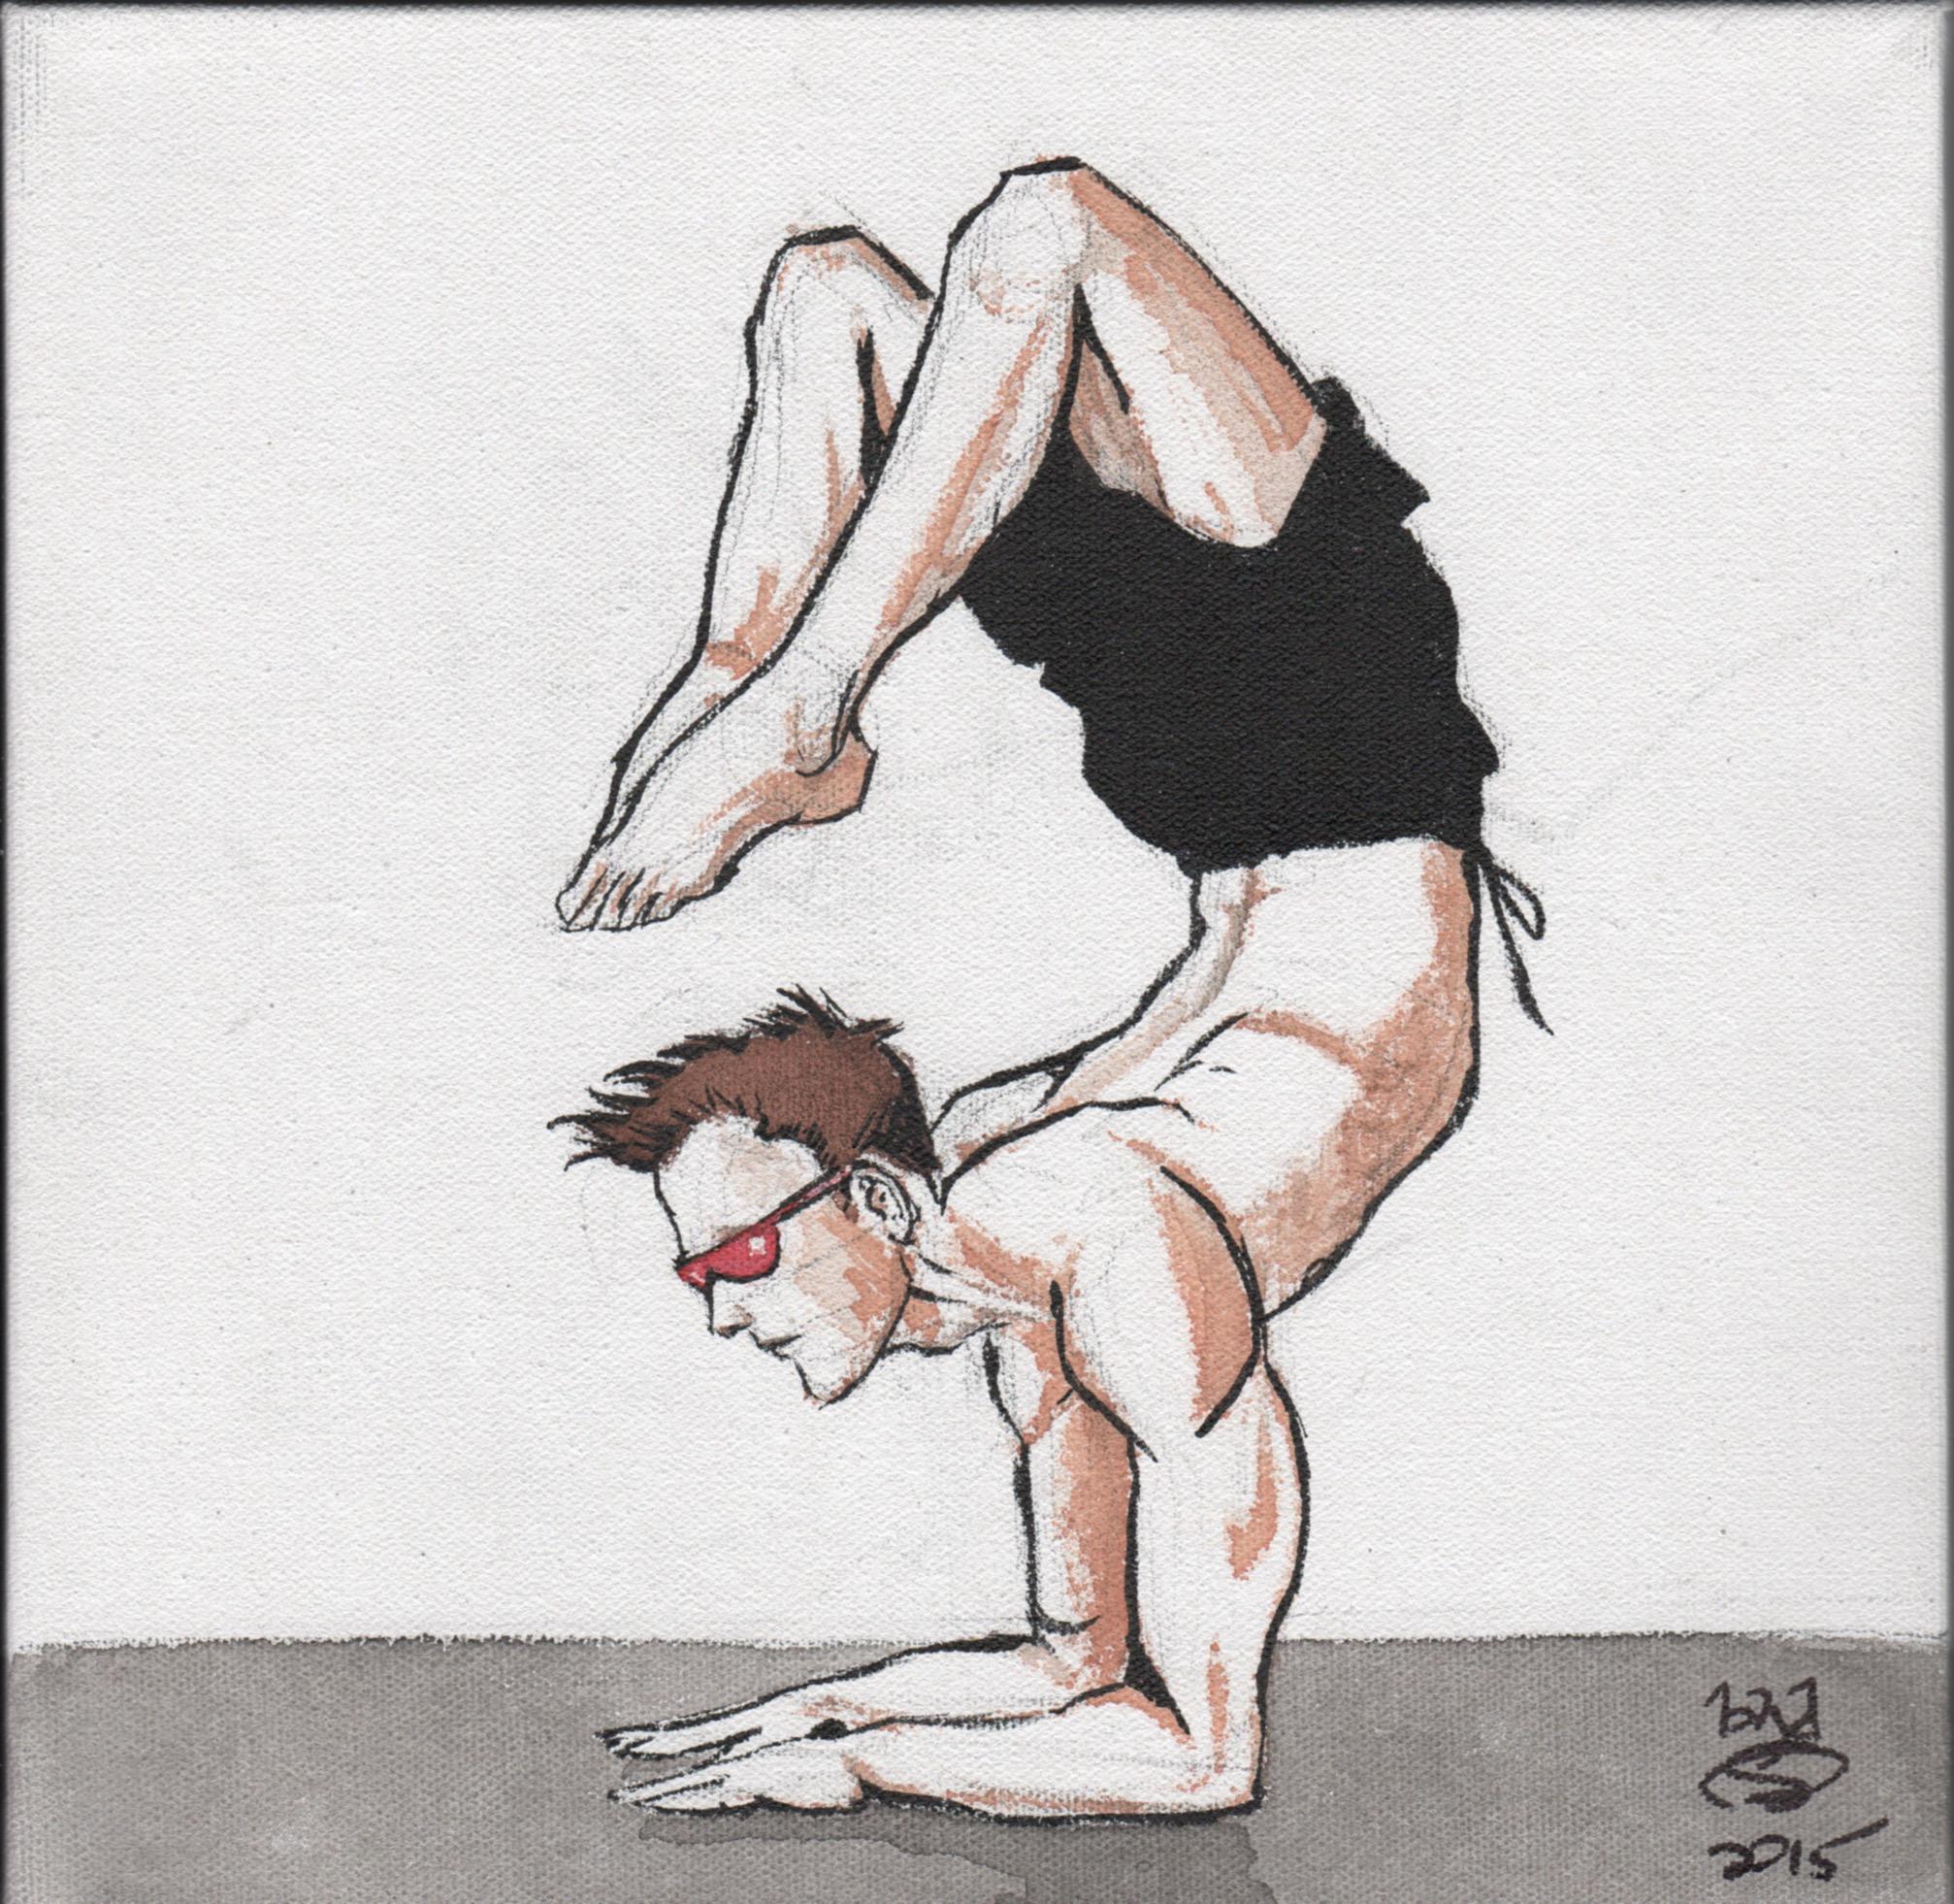 Heroic yoga series